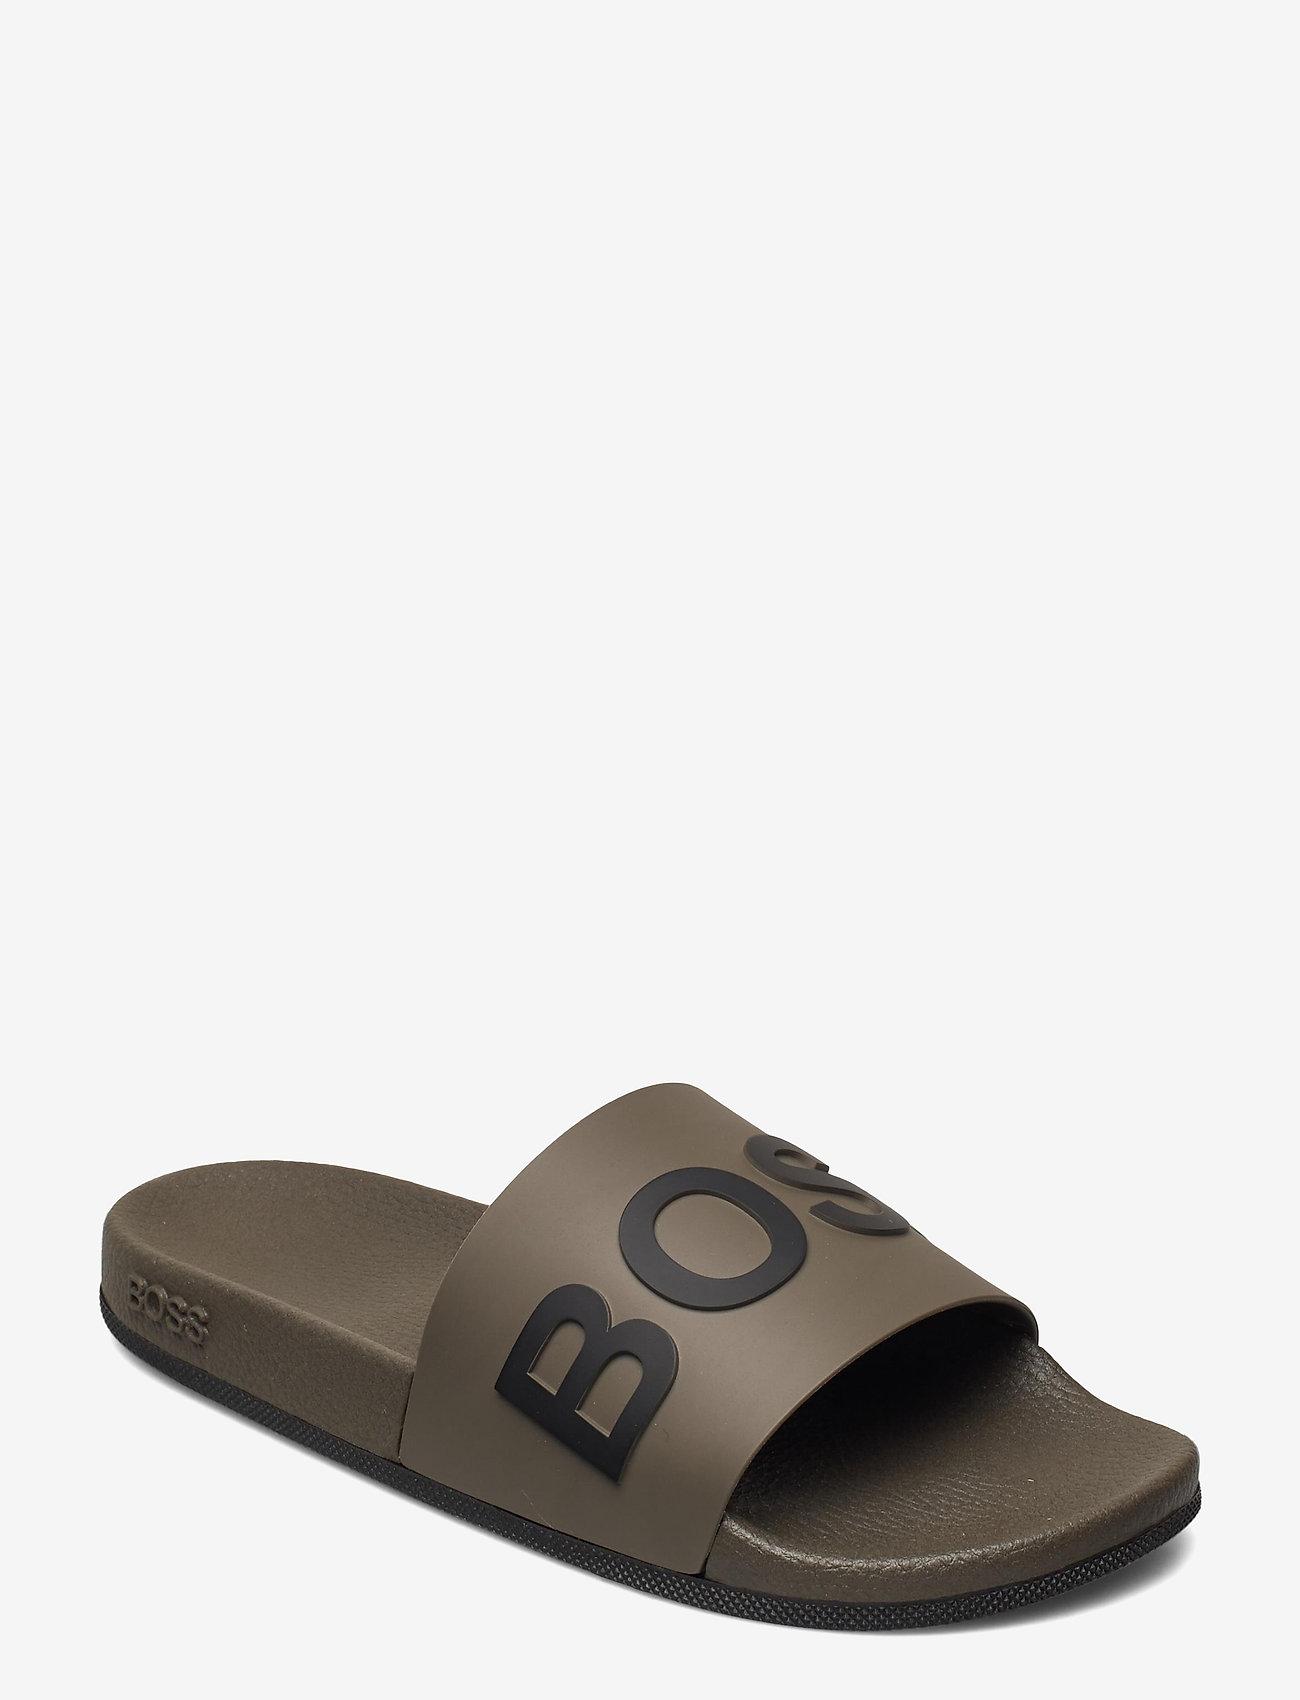 BOSS - Bay_Slid_rblg2 - pool sliders - dark green - 0